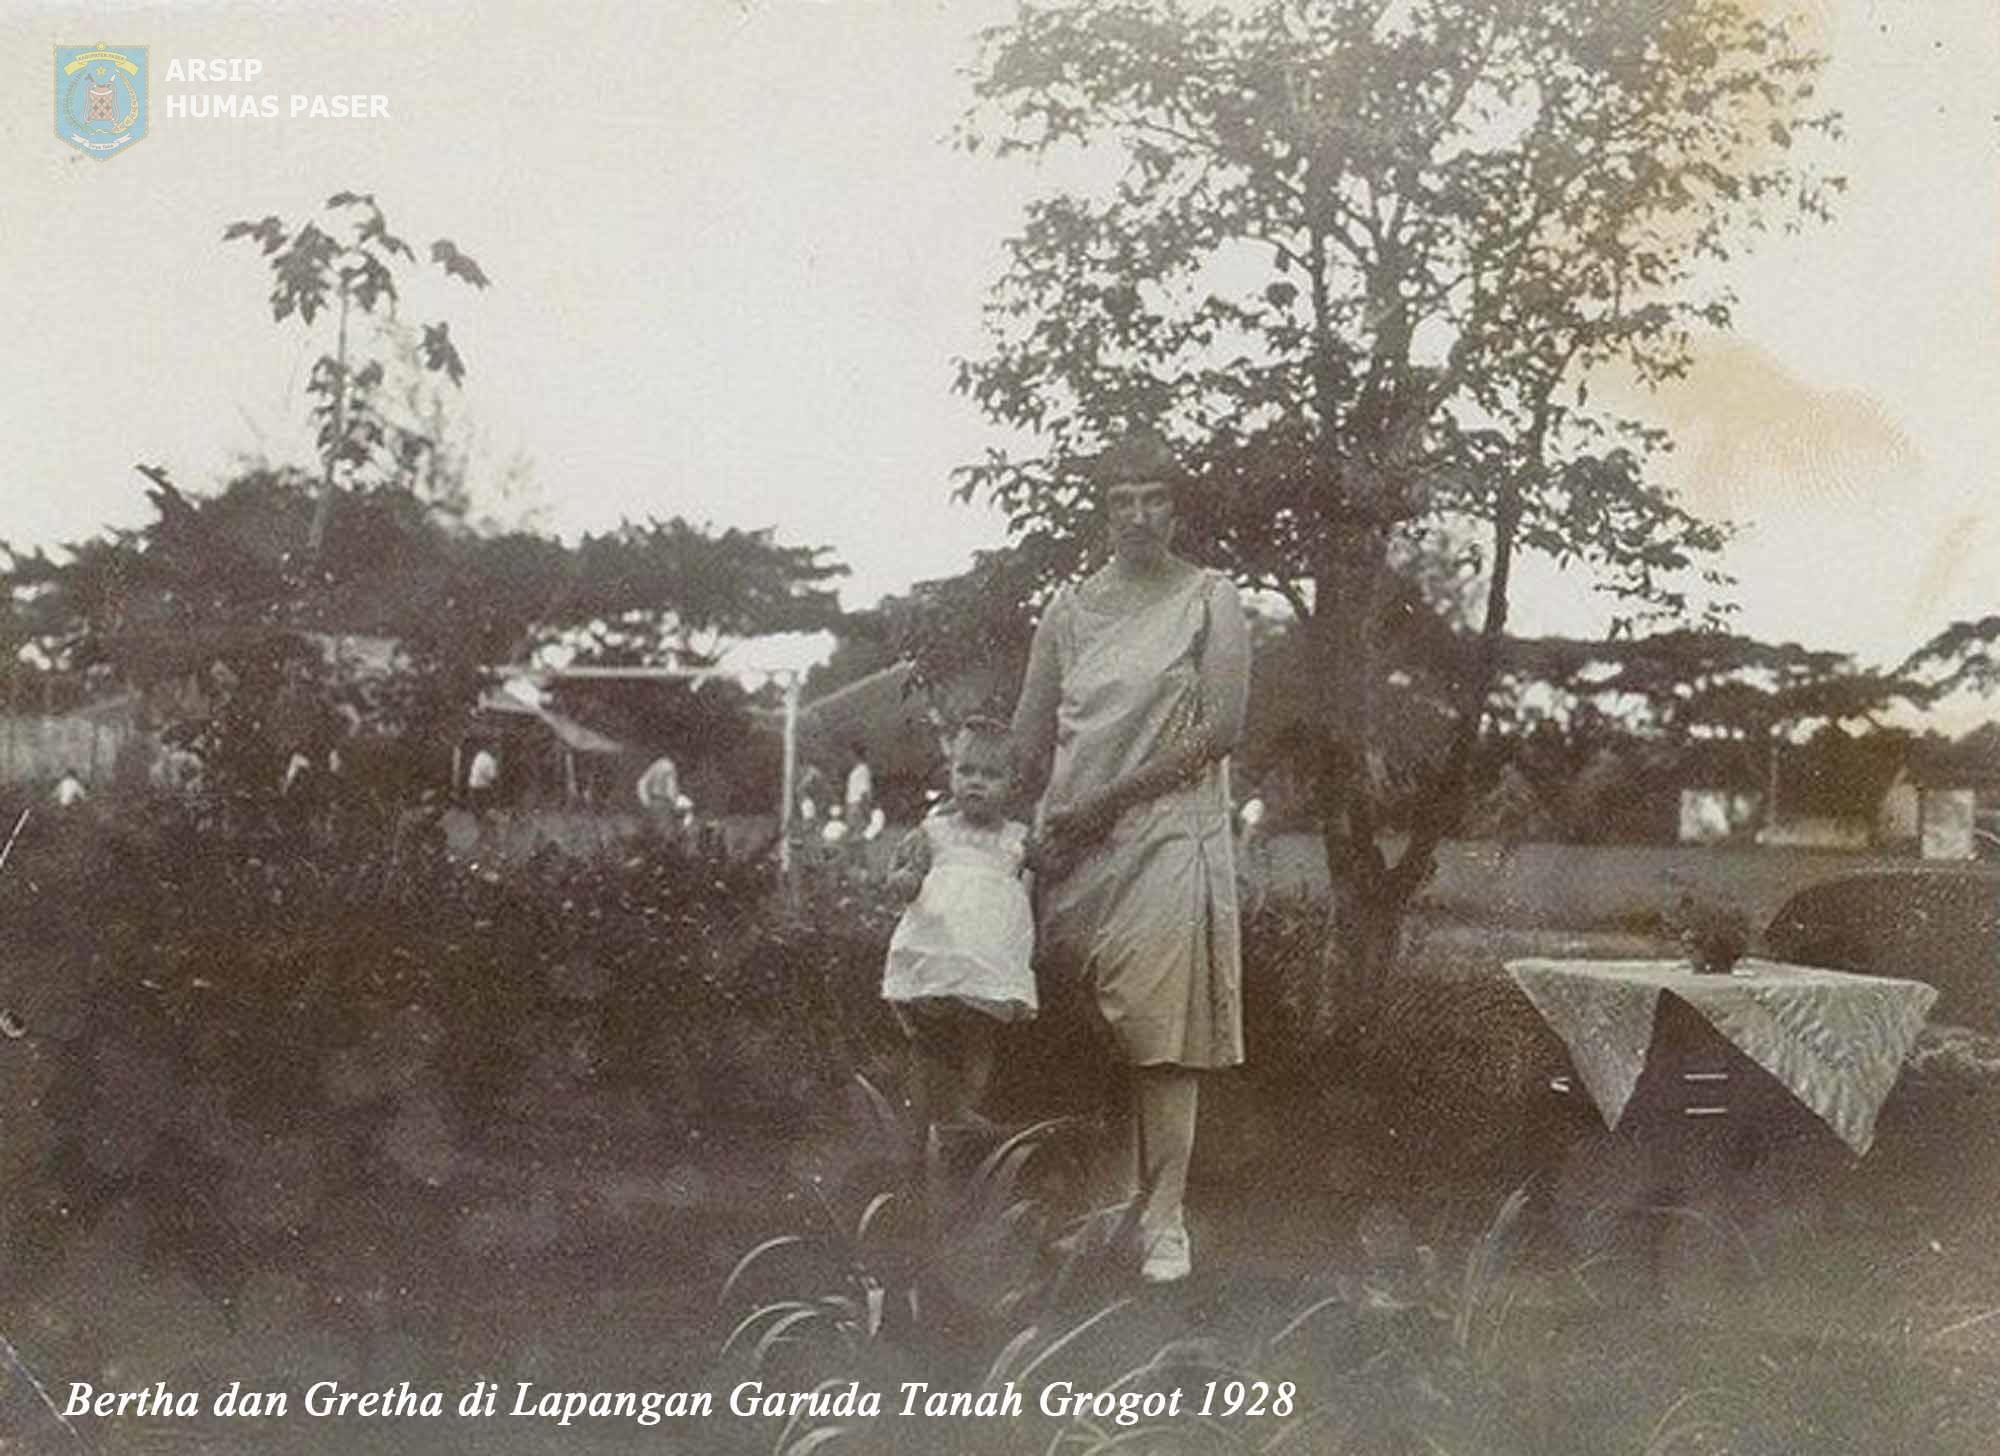 Bertha dan Gretha di Lapangan Garuda